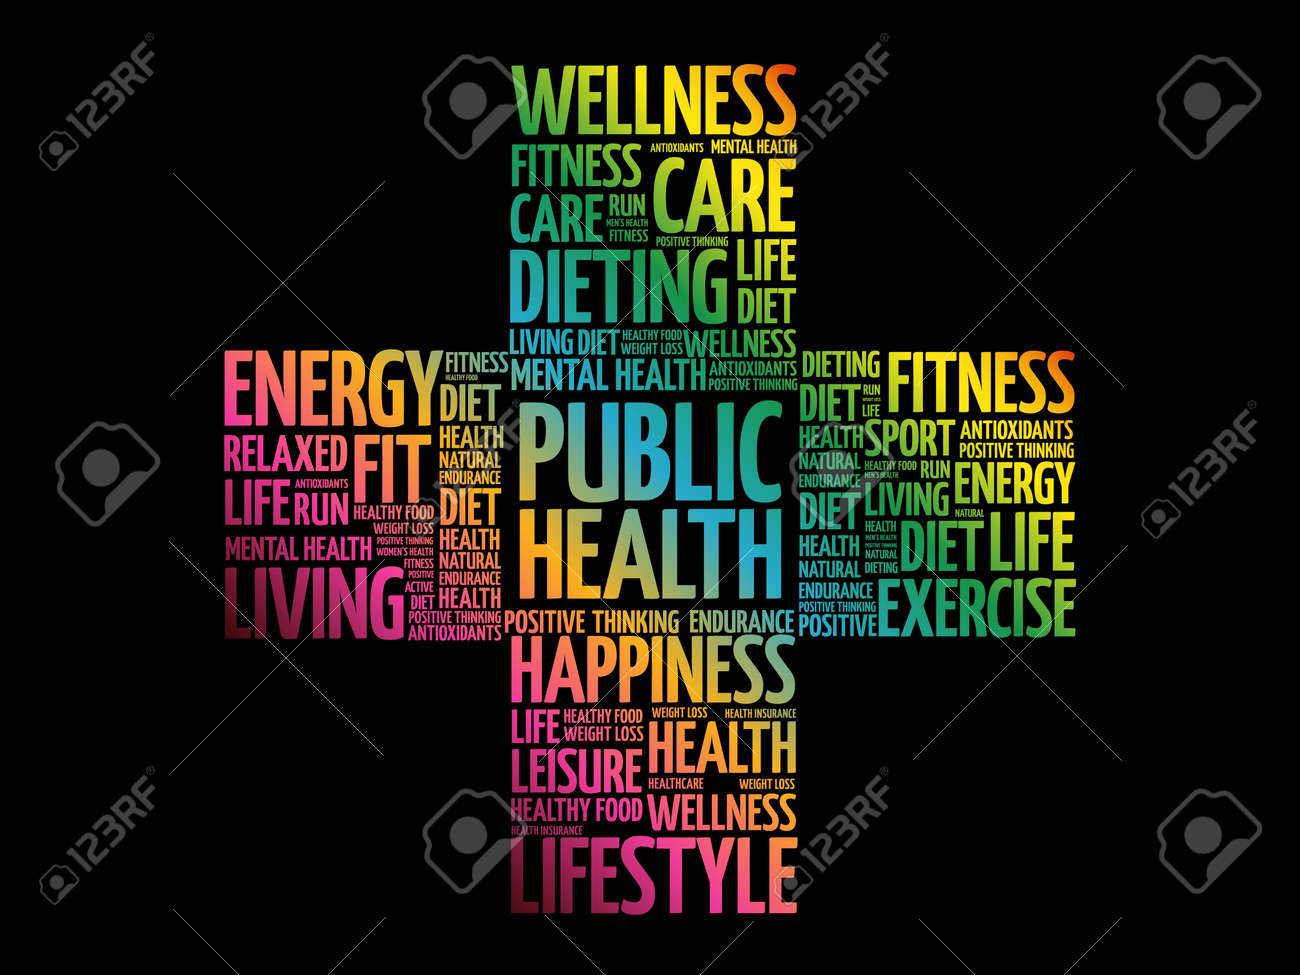 Public Health word cloud, health cross concept background - 159683850